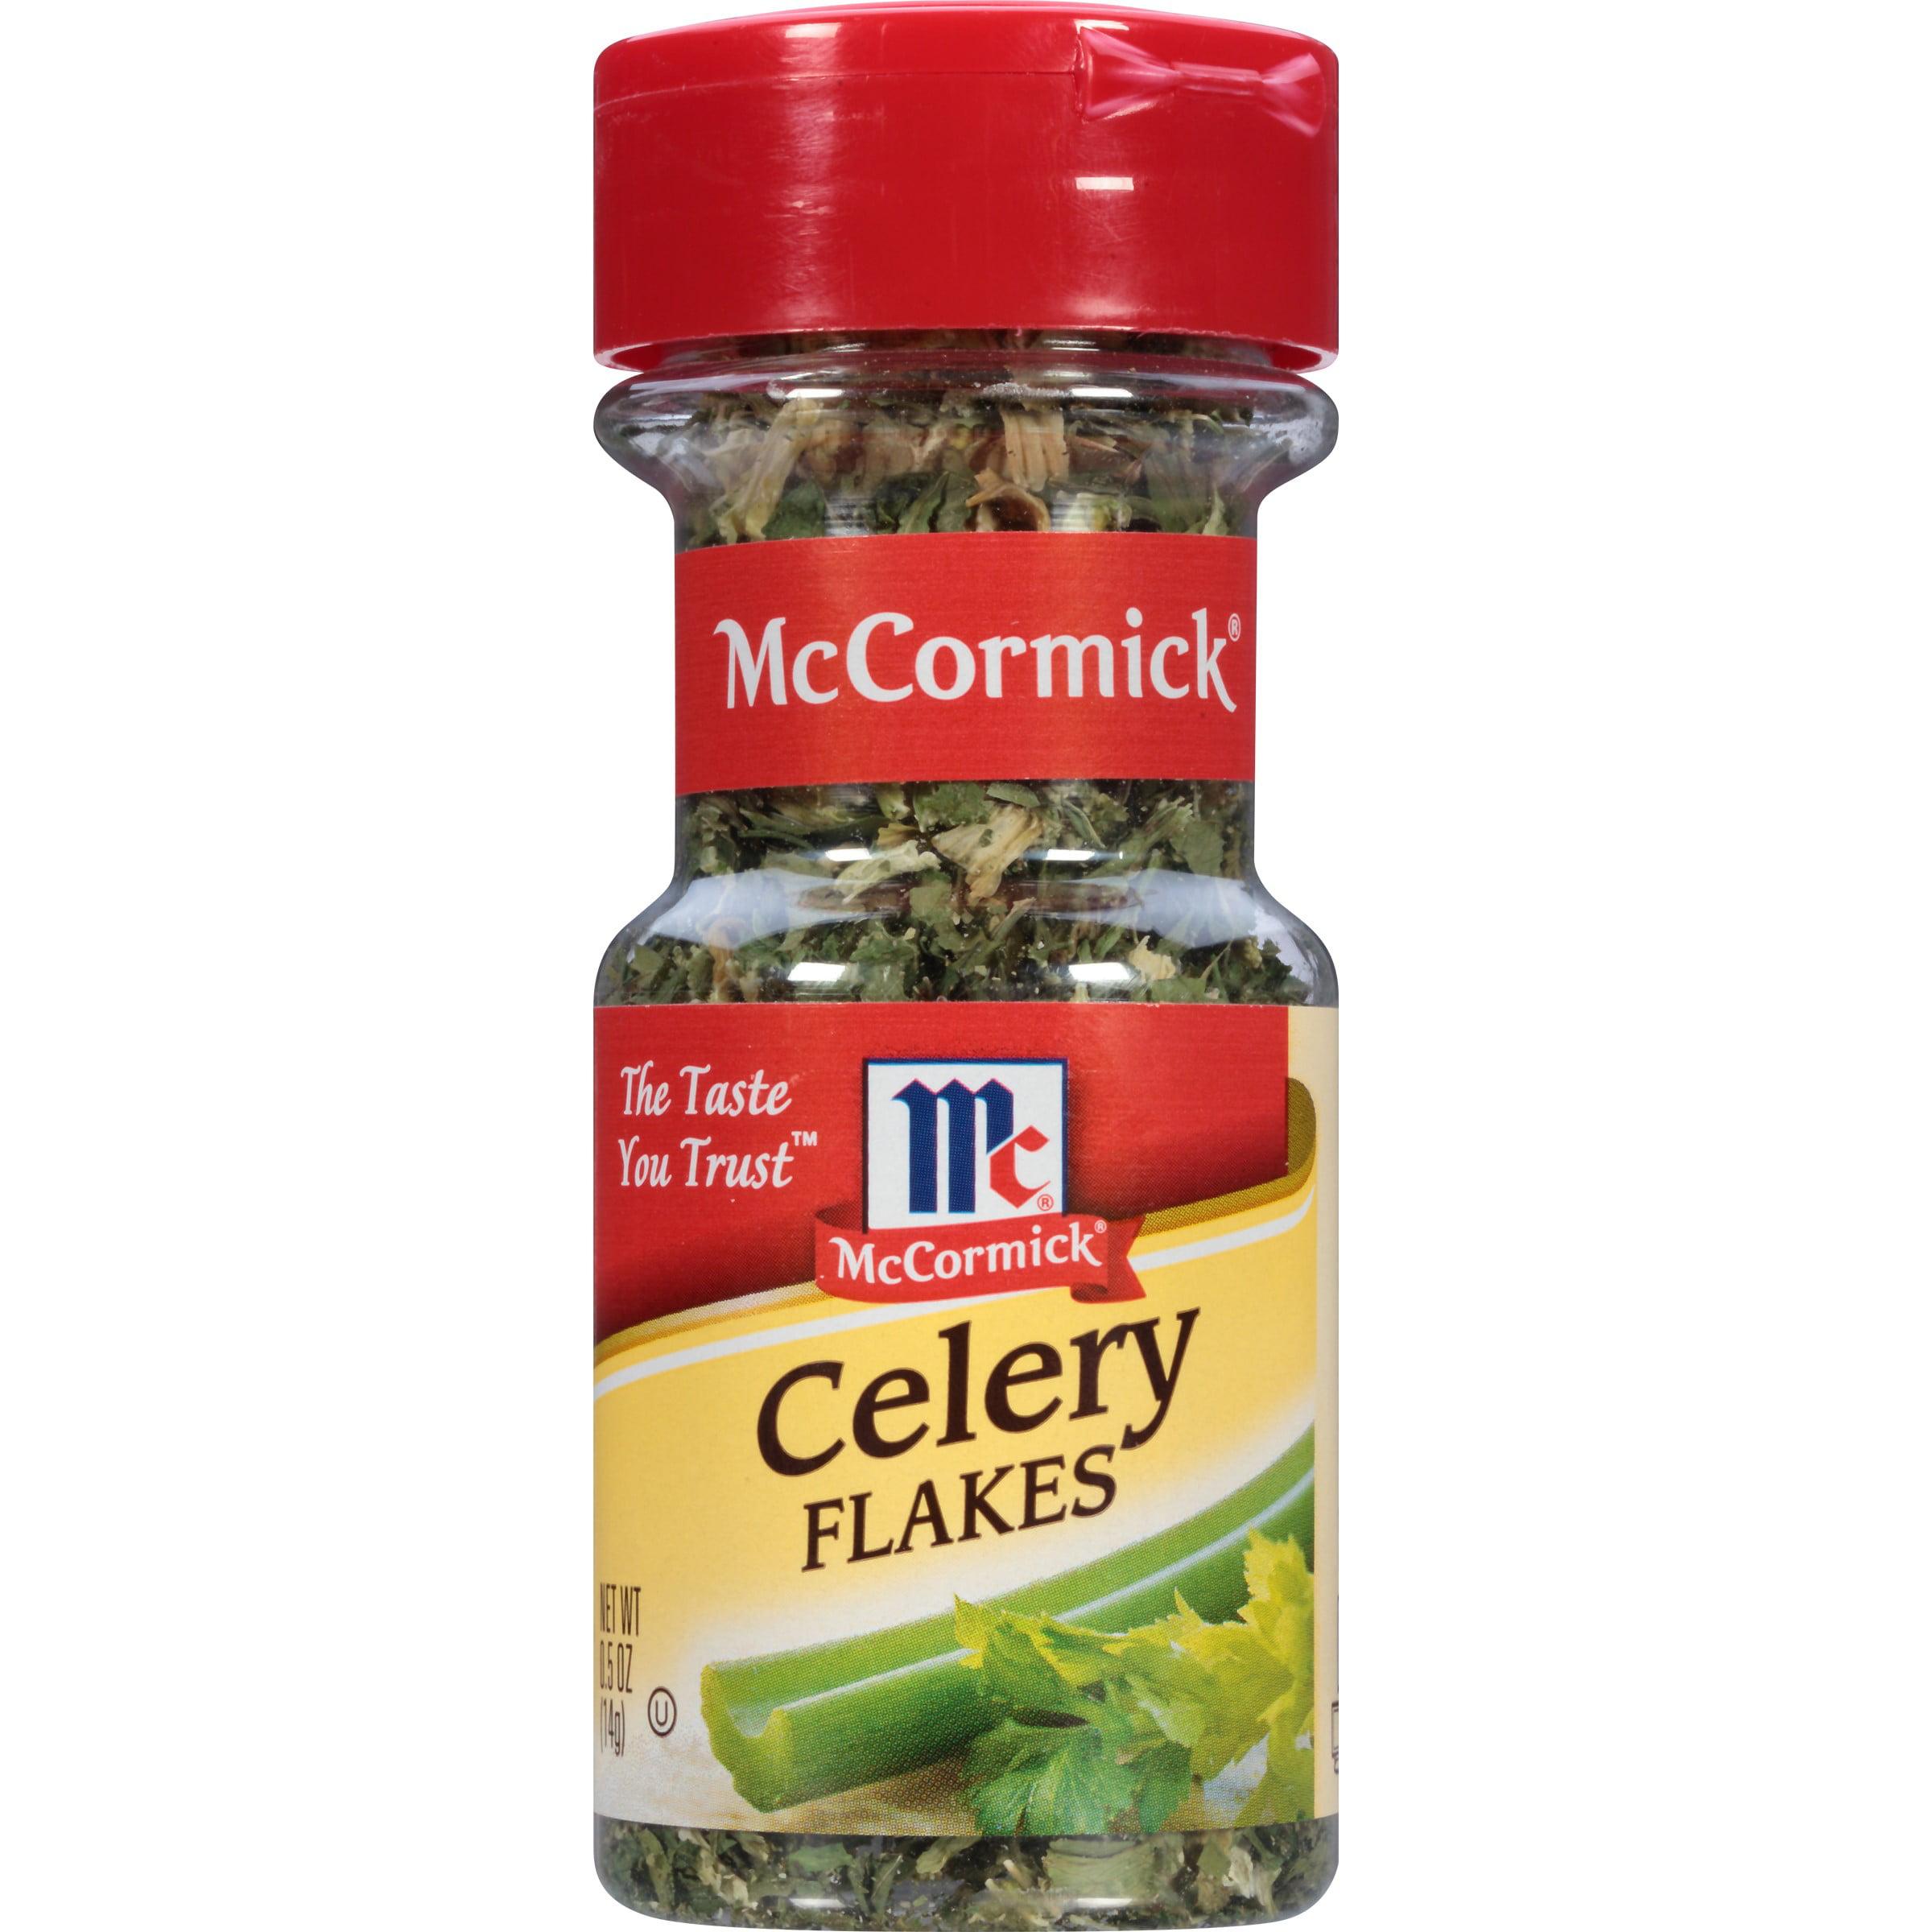 (2 Pack) McCormick Celery Flakes, 0.5 Oz